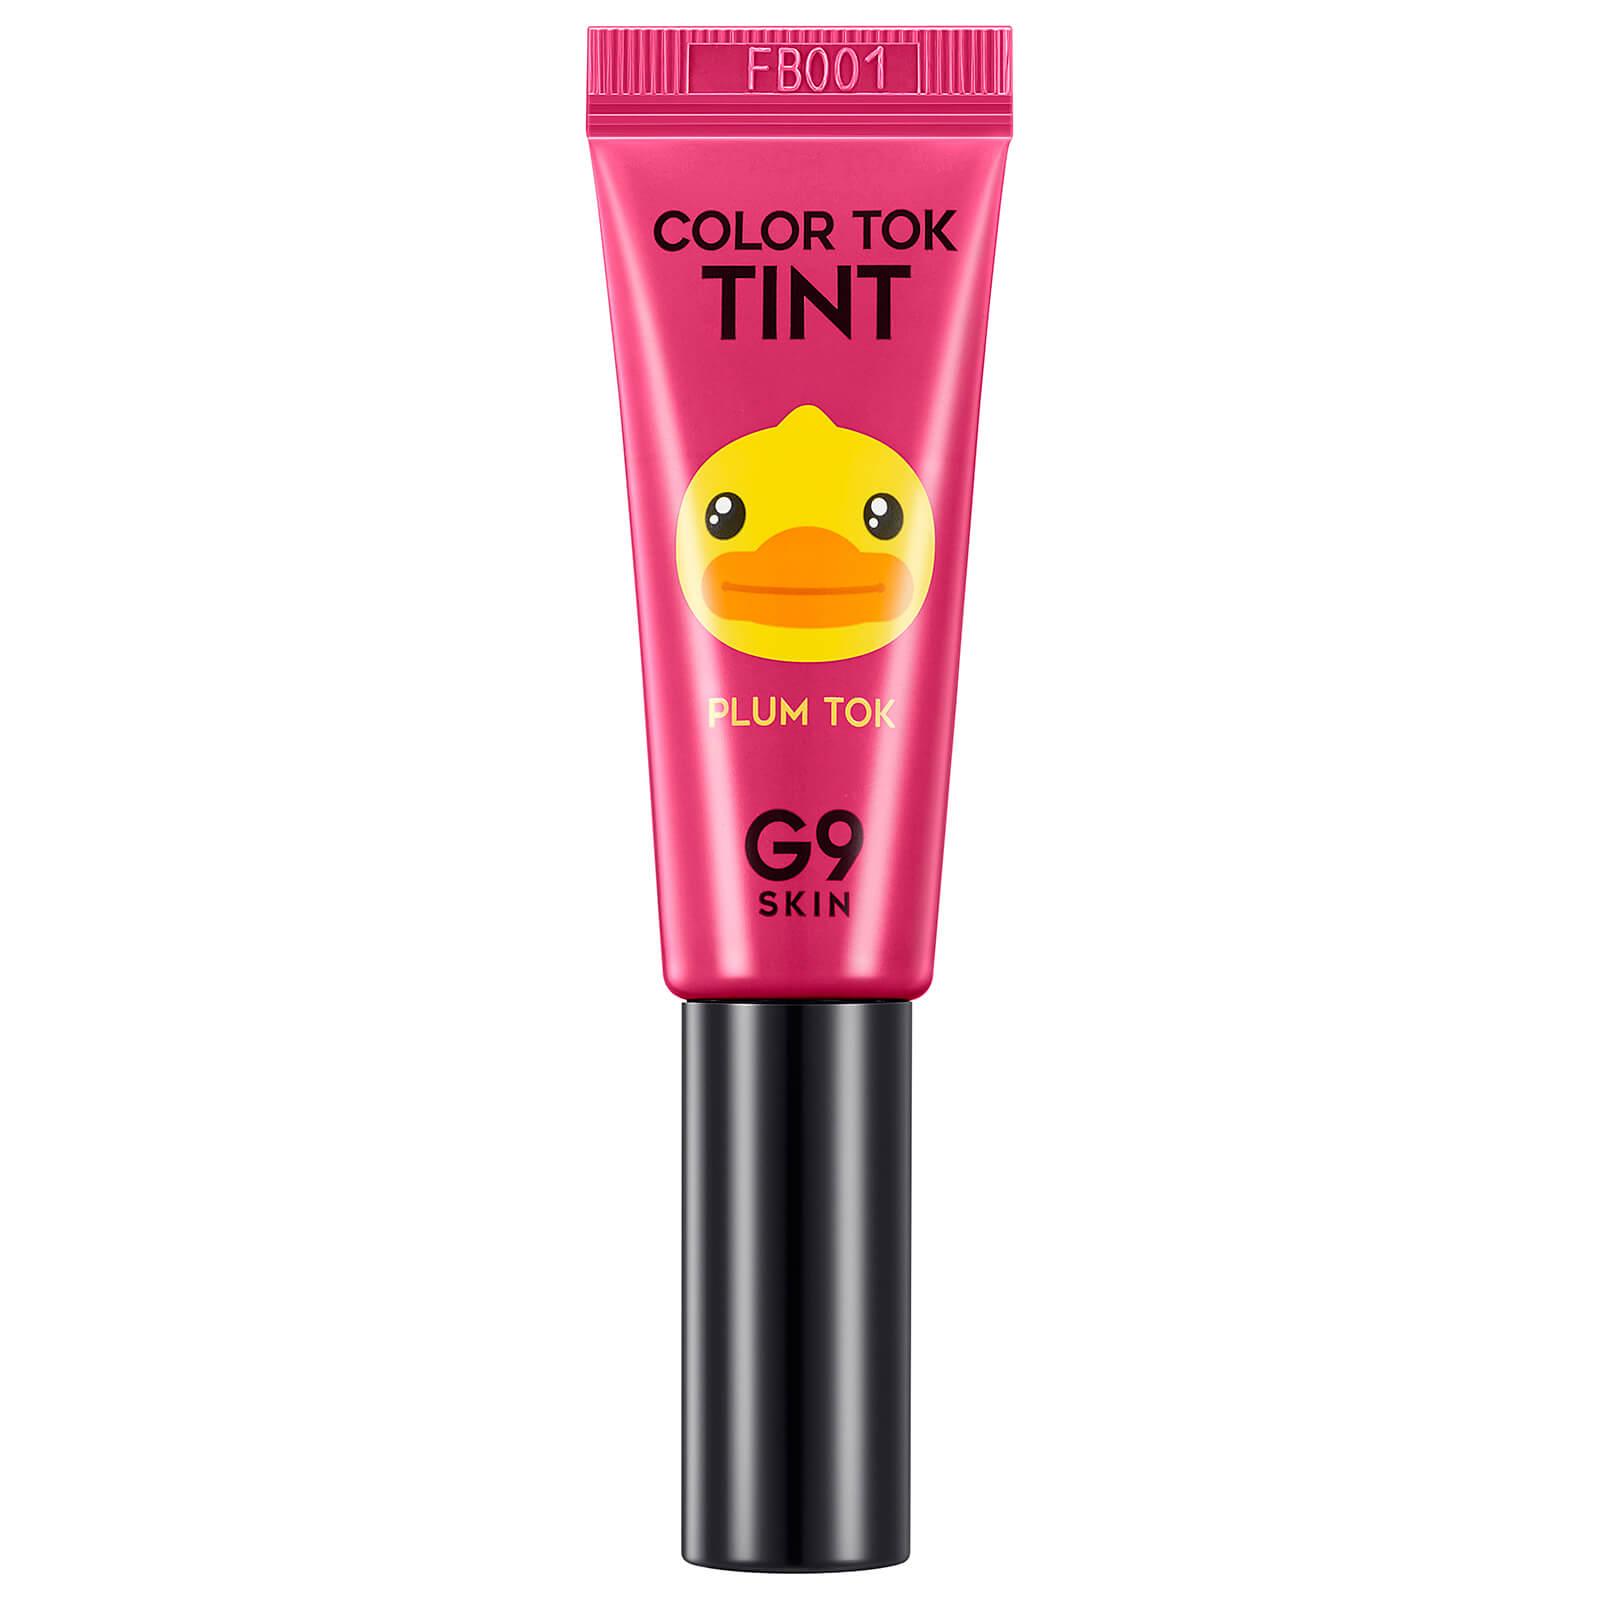 Tinte de labios Color Tok de G9SKIN